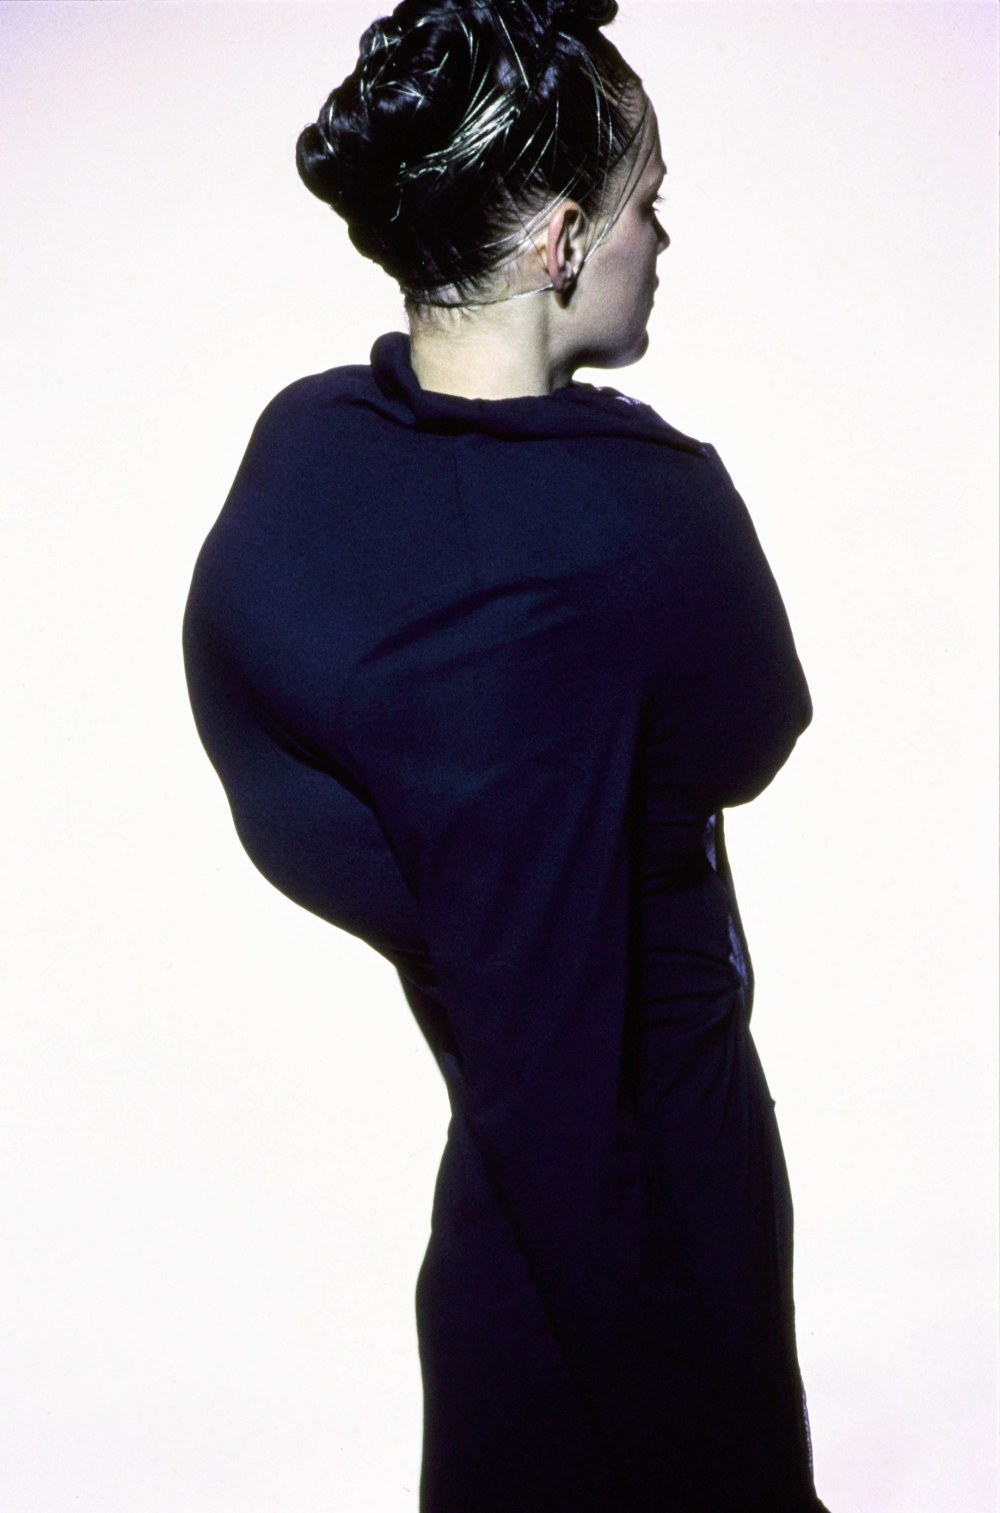 COMME-DES-GARCONS-SPRING-1997-RTW-DETAIL-10